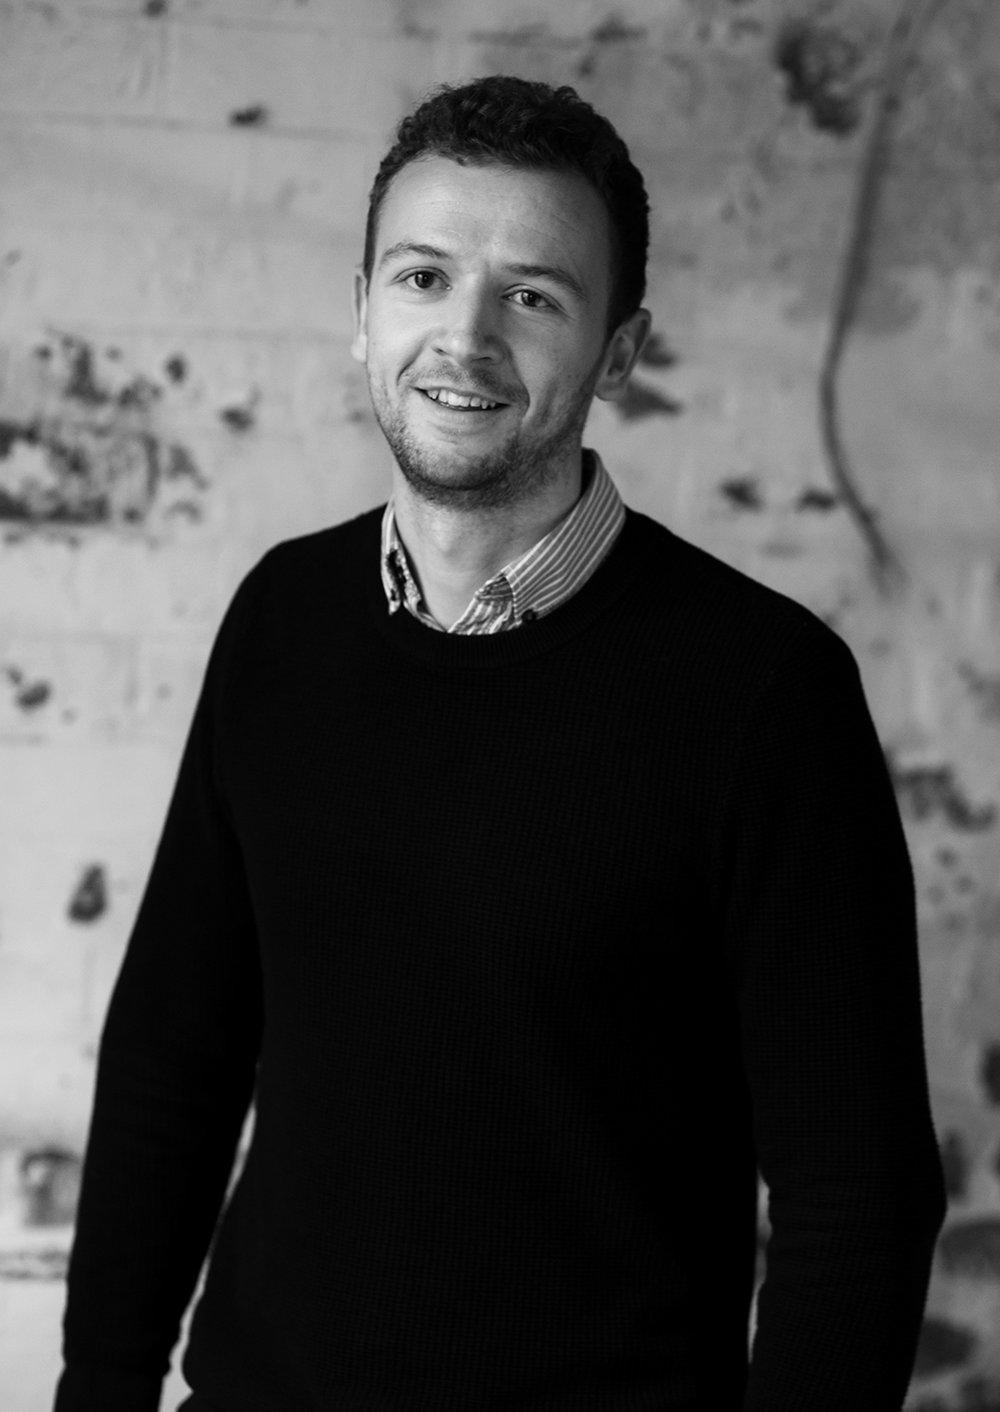 Liam Marsden - Pt. II Architectural Assistant